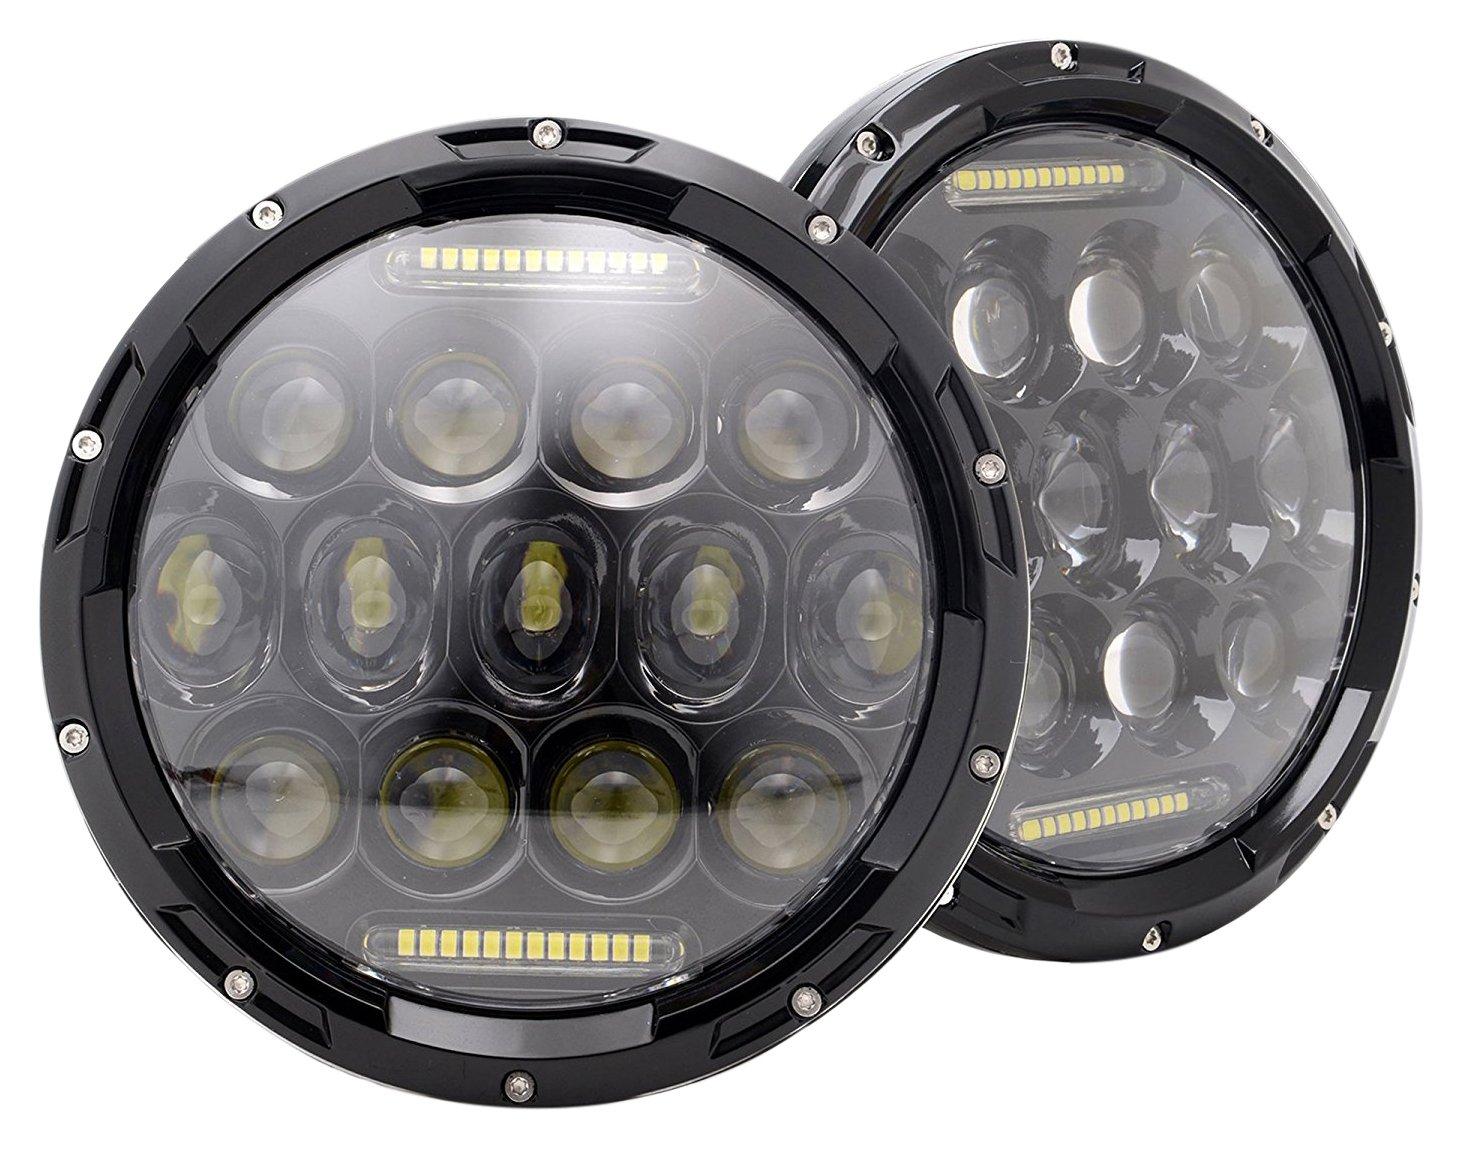 Turbosii Dot Approved Pair 7 75w Round Driving Led Fluorescent Light Bulbs Diagram Lamp Eurolite 23w Has A Headlights With White Drl Hi Lo Beam For Jeep Wrangler Cj 5 1997 2017 Tj Lj Jk Jku